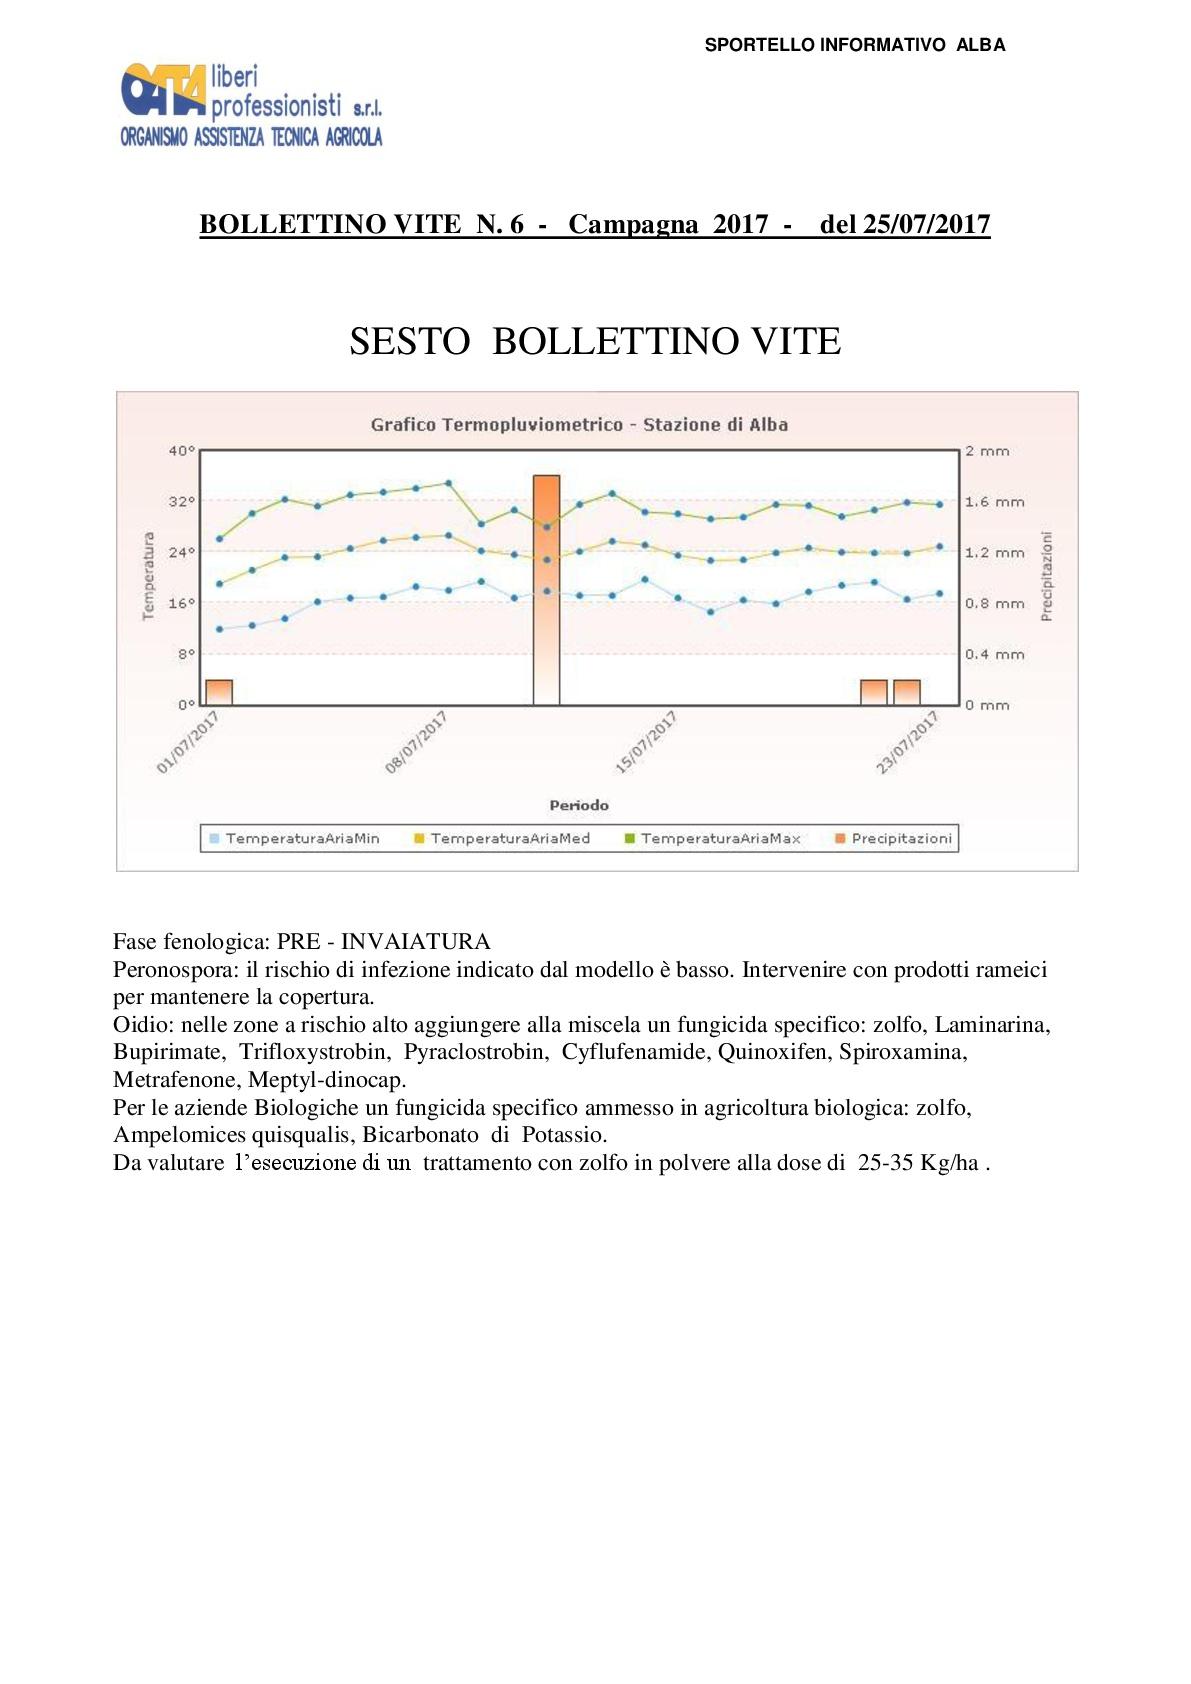 bollettino-vite-6-2017-001